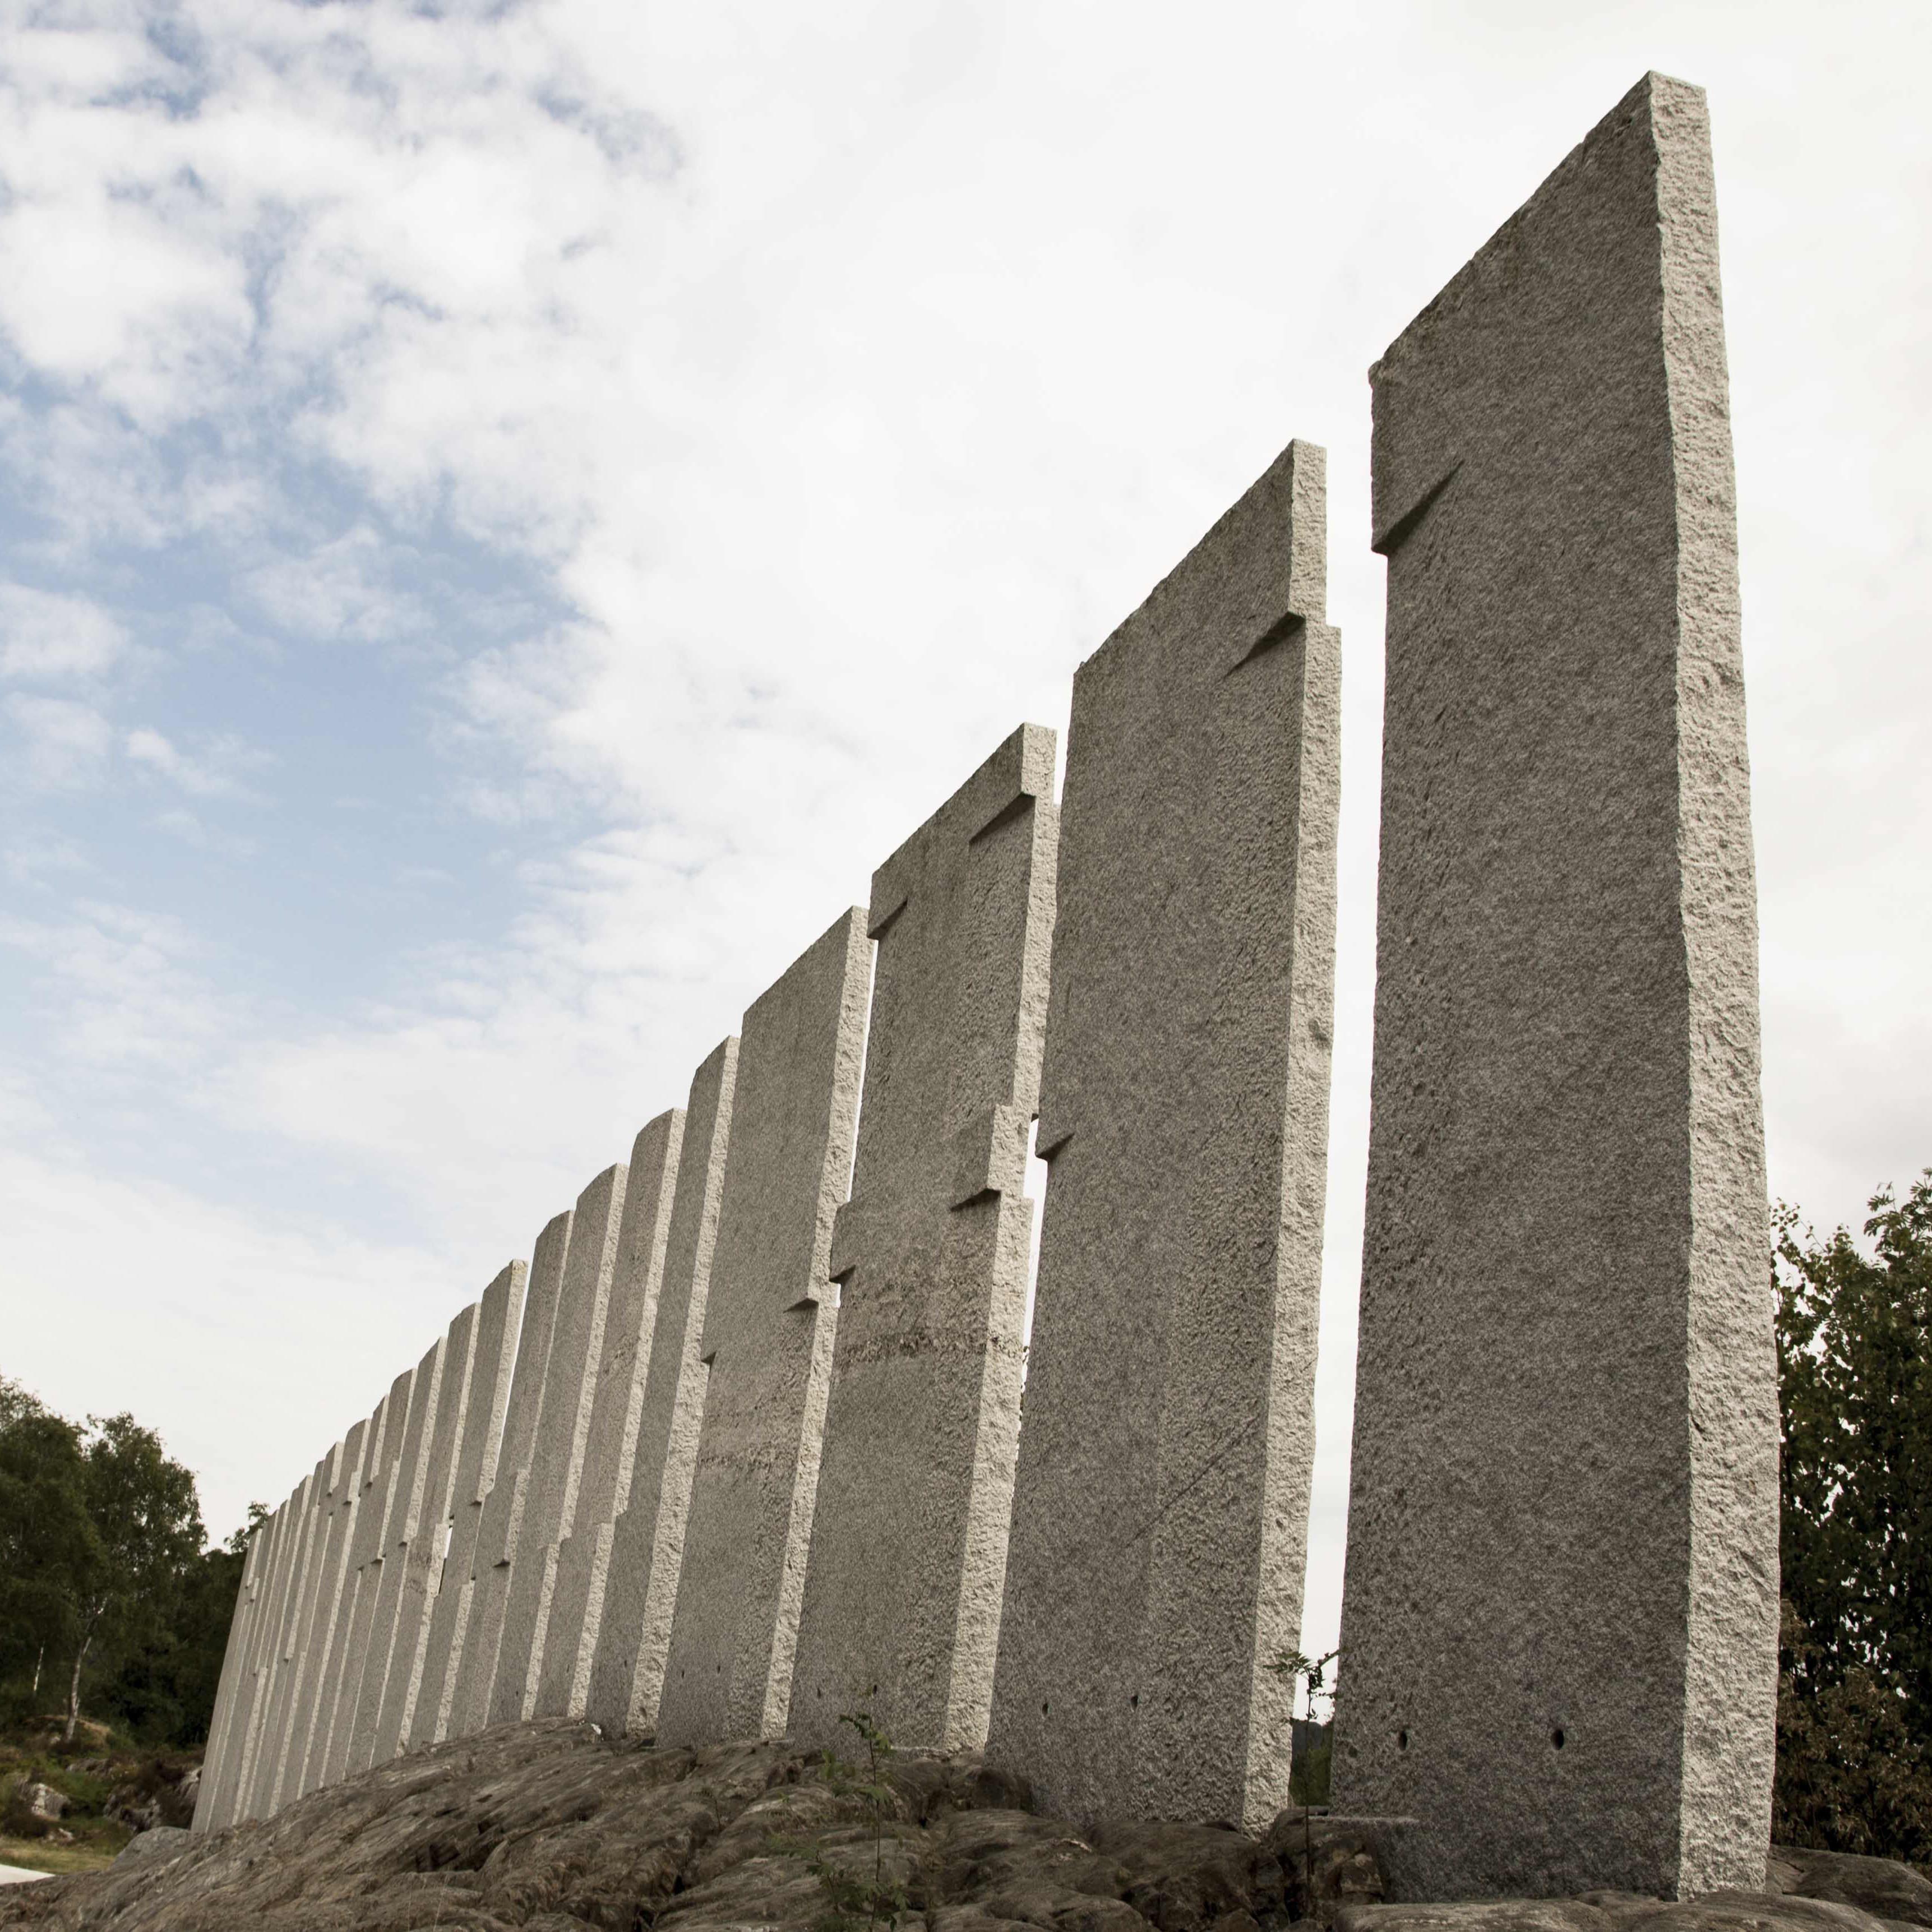 Tingveggen at Gulatinget is an art instalation created by famous artist Bård Breivik.